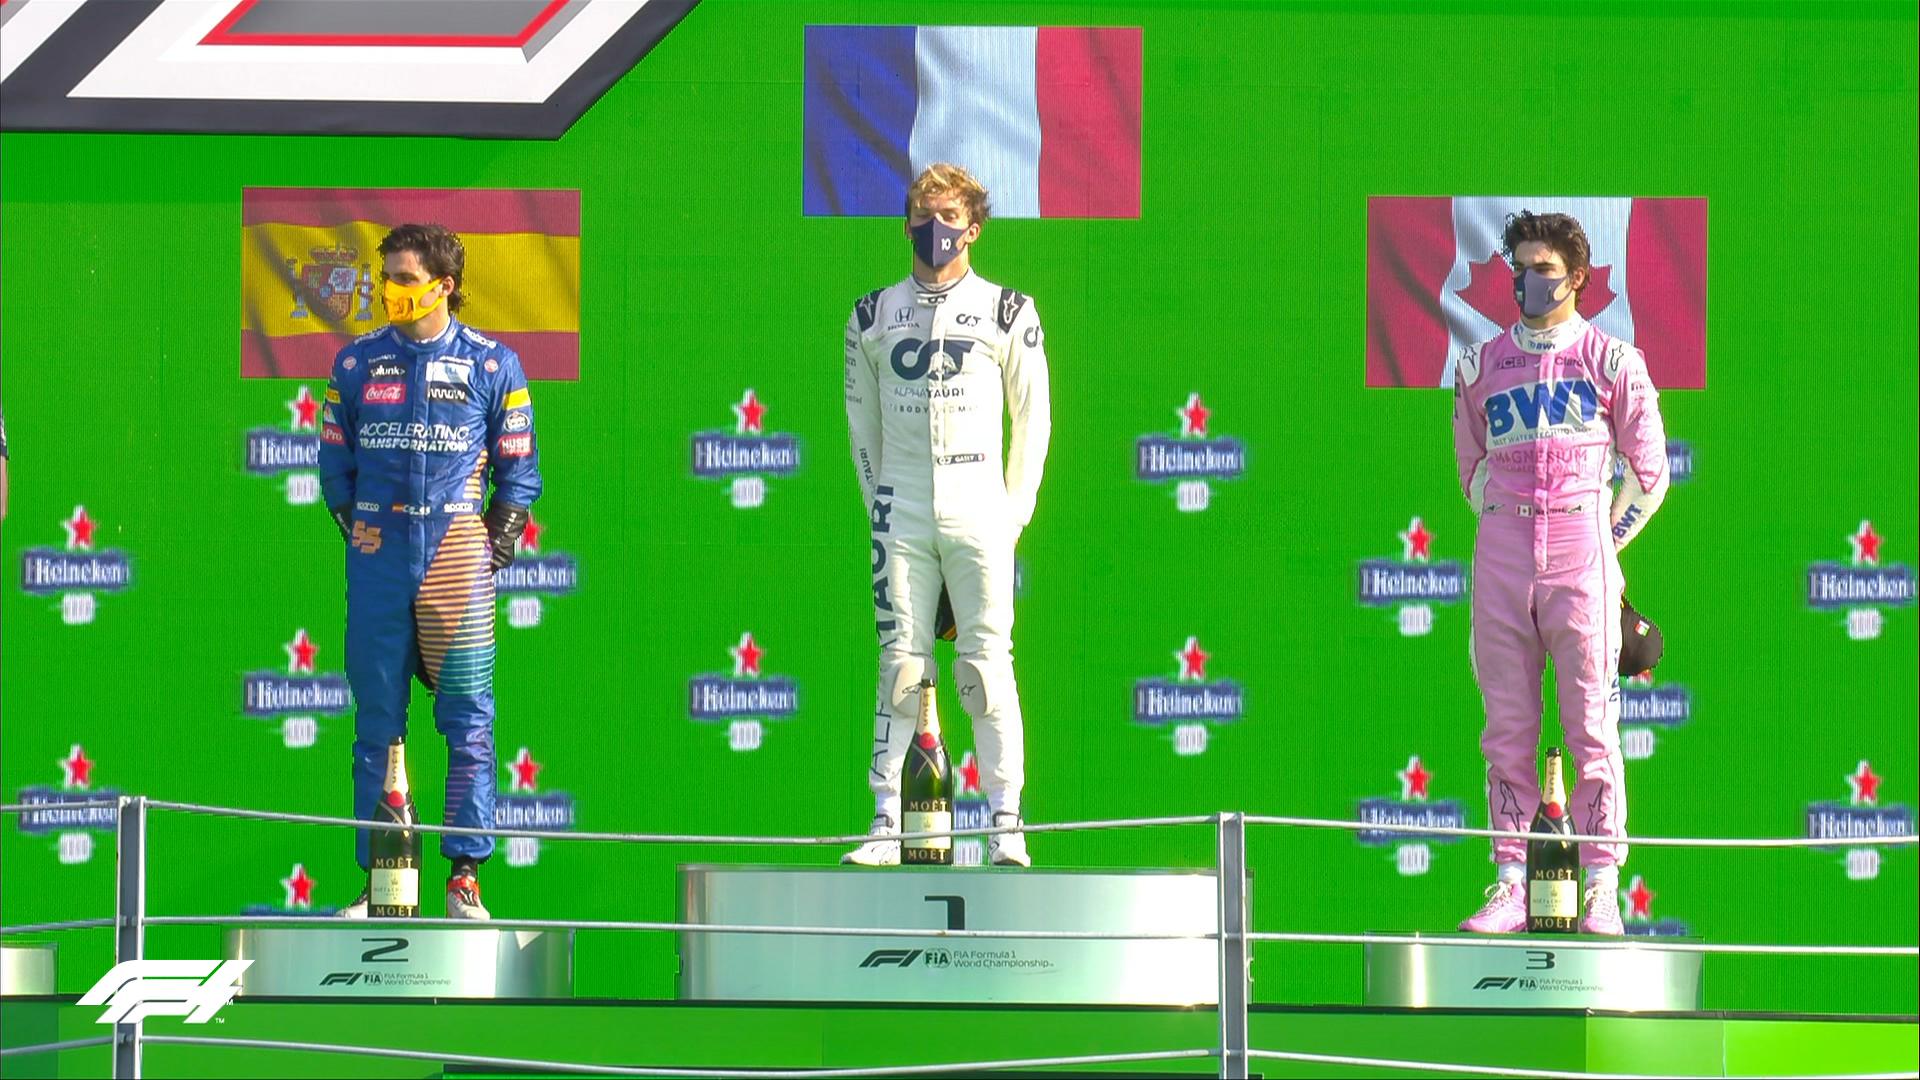 Italian GP 2020 Results